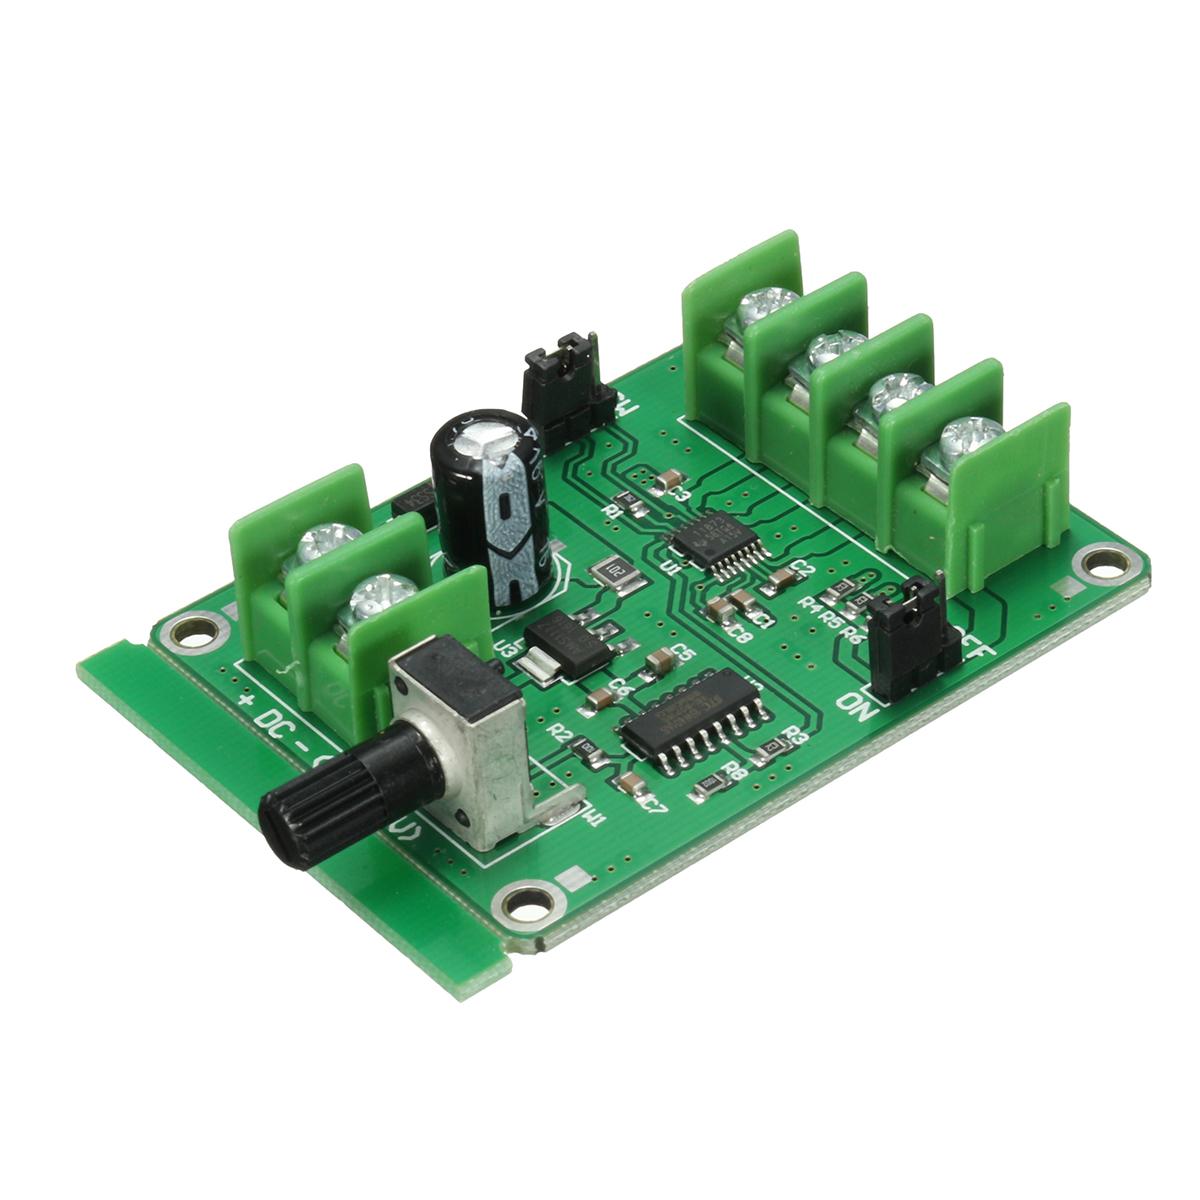 5pcs 5v 12v Dc Brushless Motor Driver Board Controller For Hard Circuit Drive 3